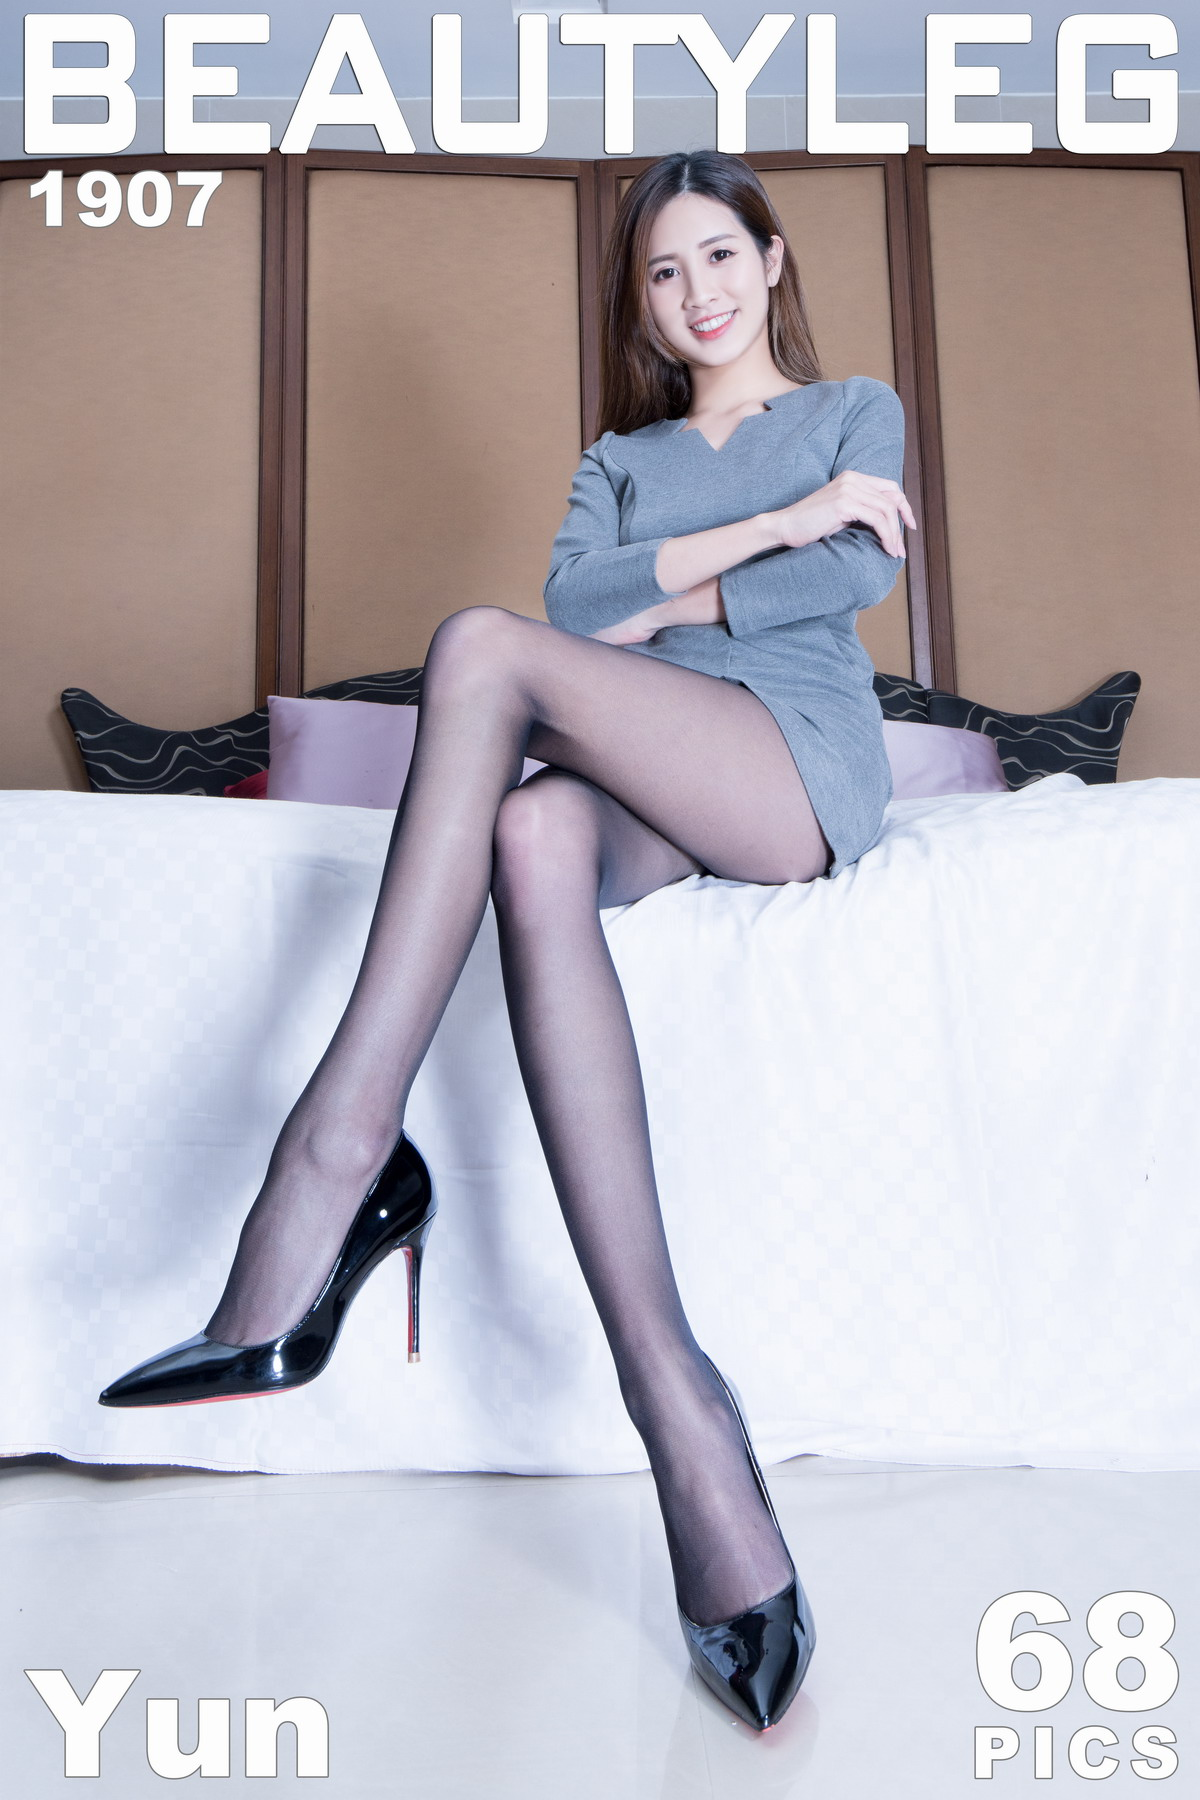 [Beautyleg]美腿写真 2020.04.13 No.1907 Yun[/620MB]